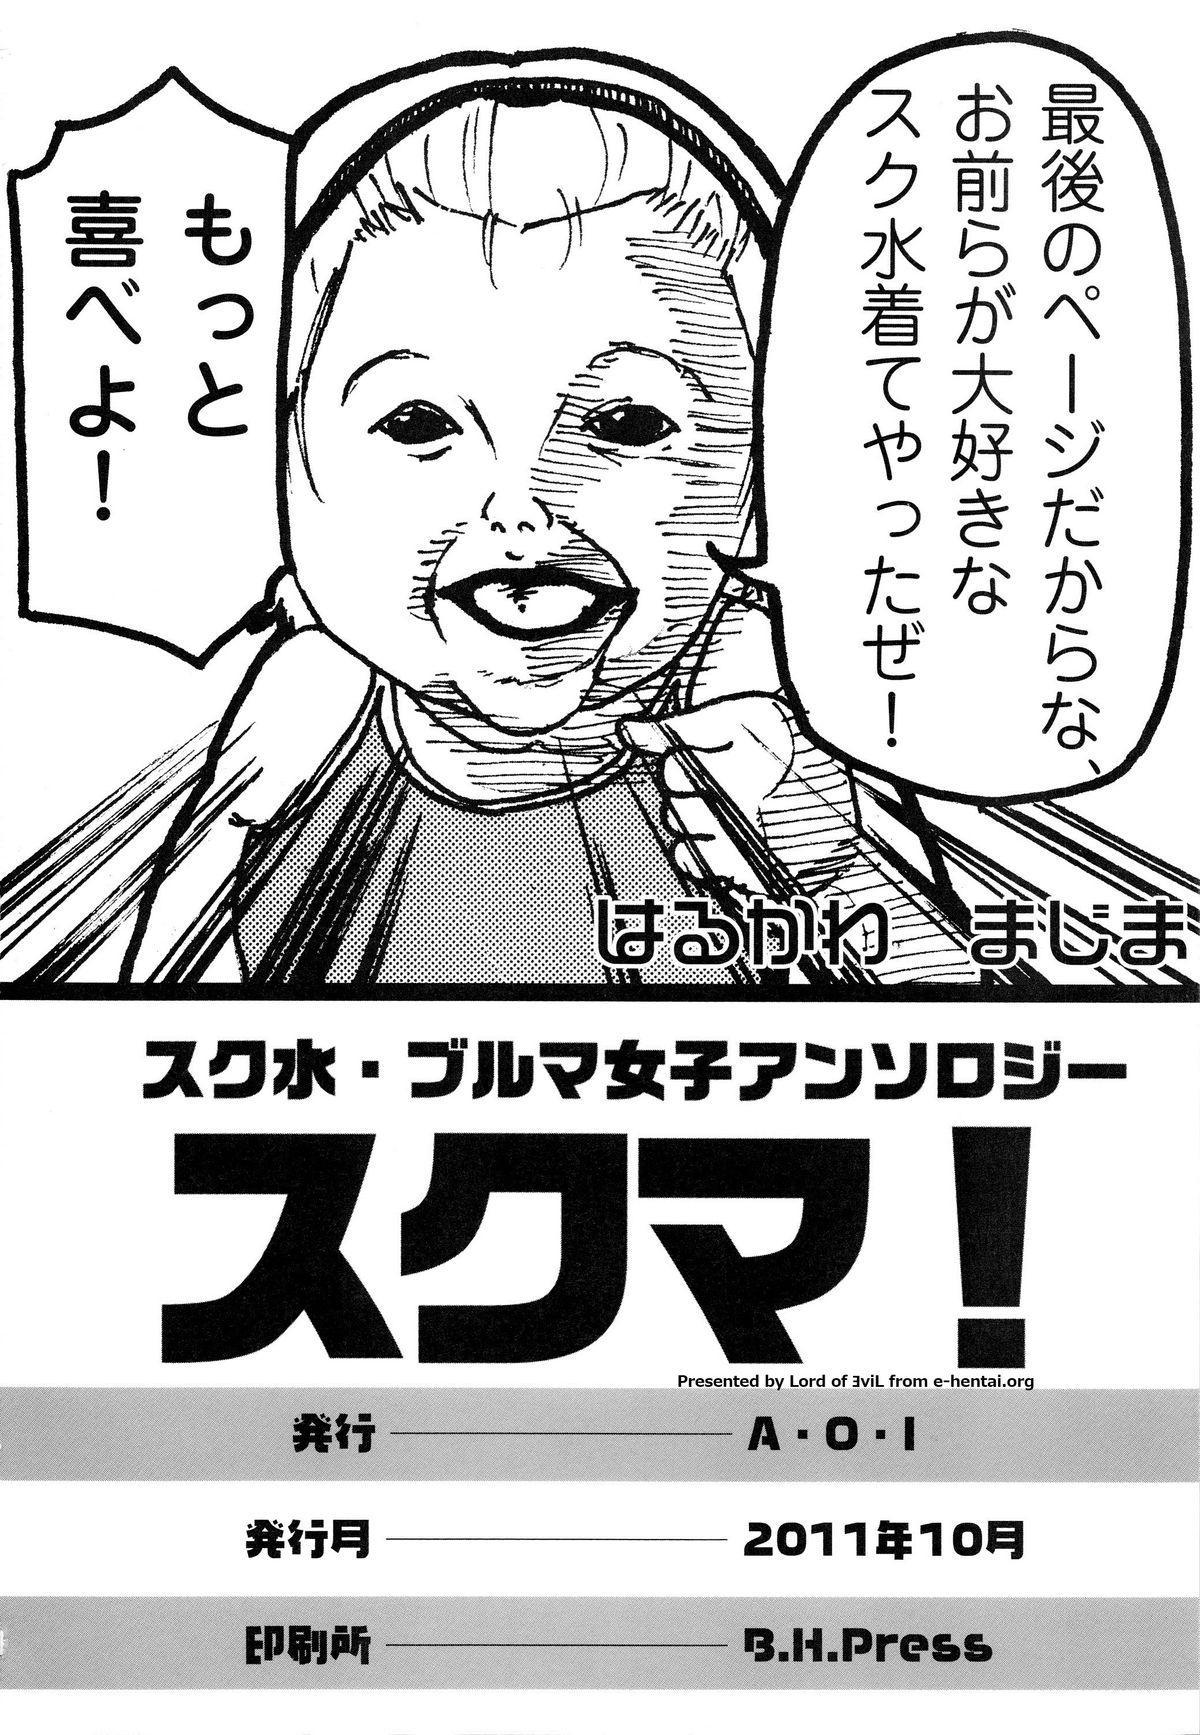 School-mer! School Mizugi Bloomer Joshi Anthology 128